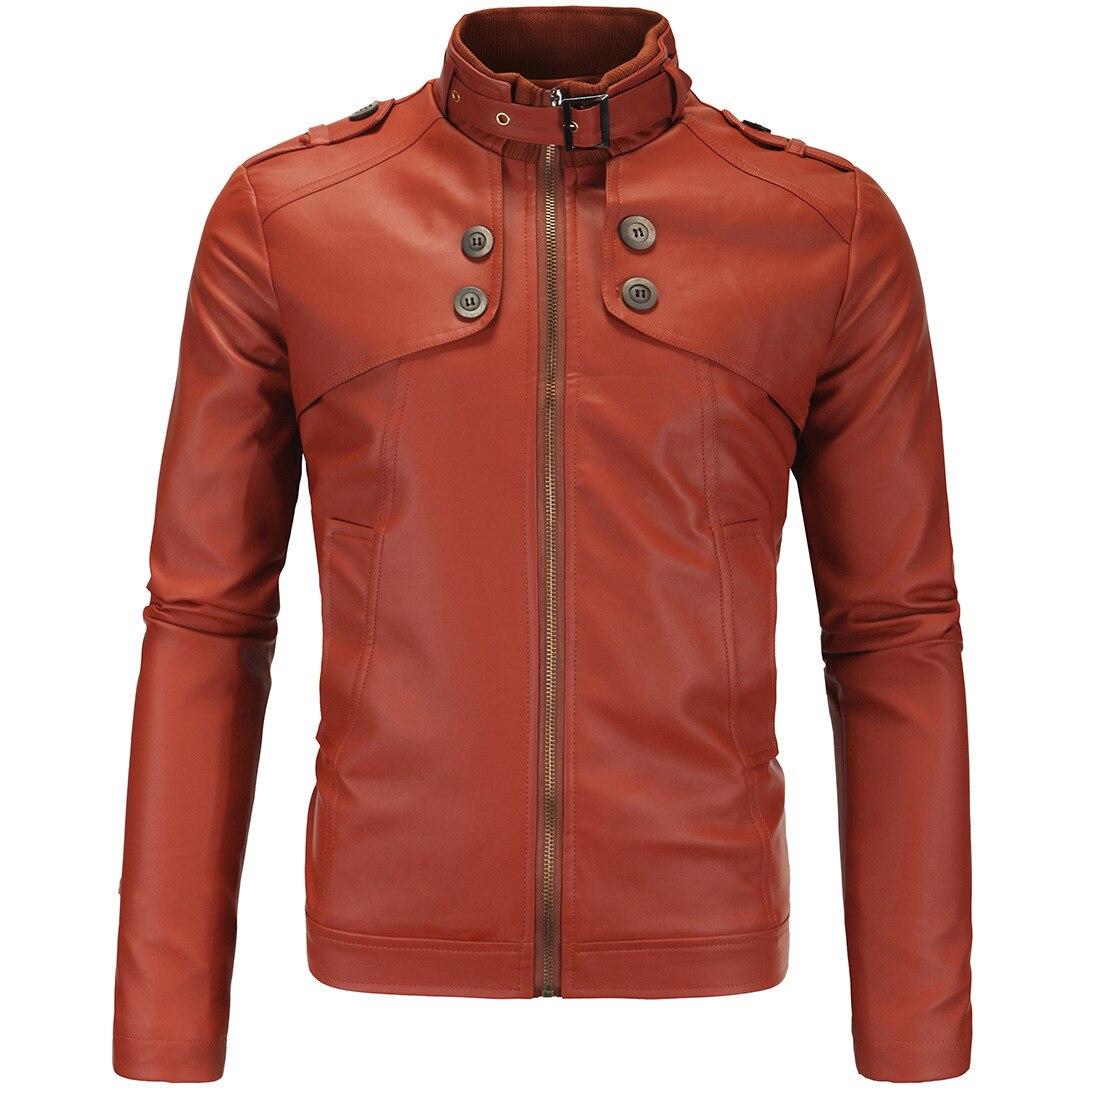 Popular Fashion In 2017 A New Leather Jacket genuine Leather sheepskin motorcycle Man Coat leather Jacket